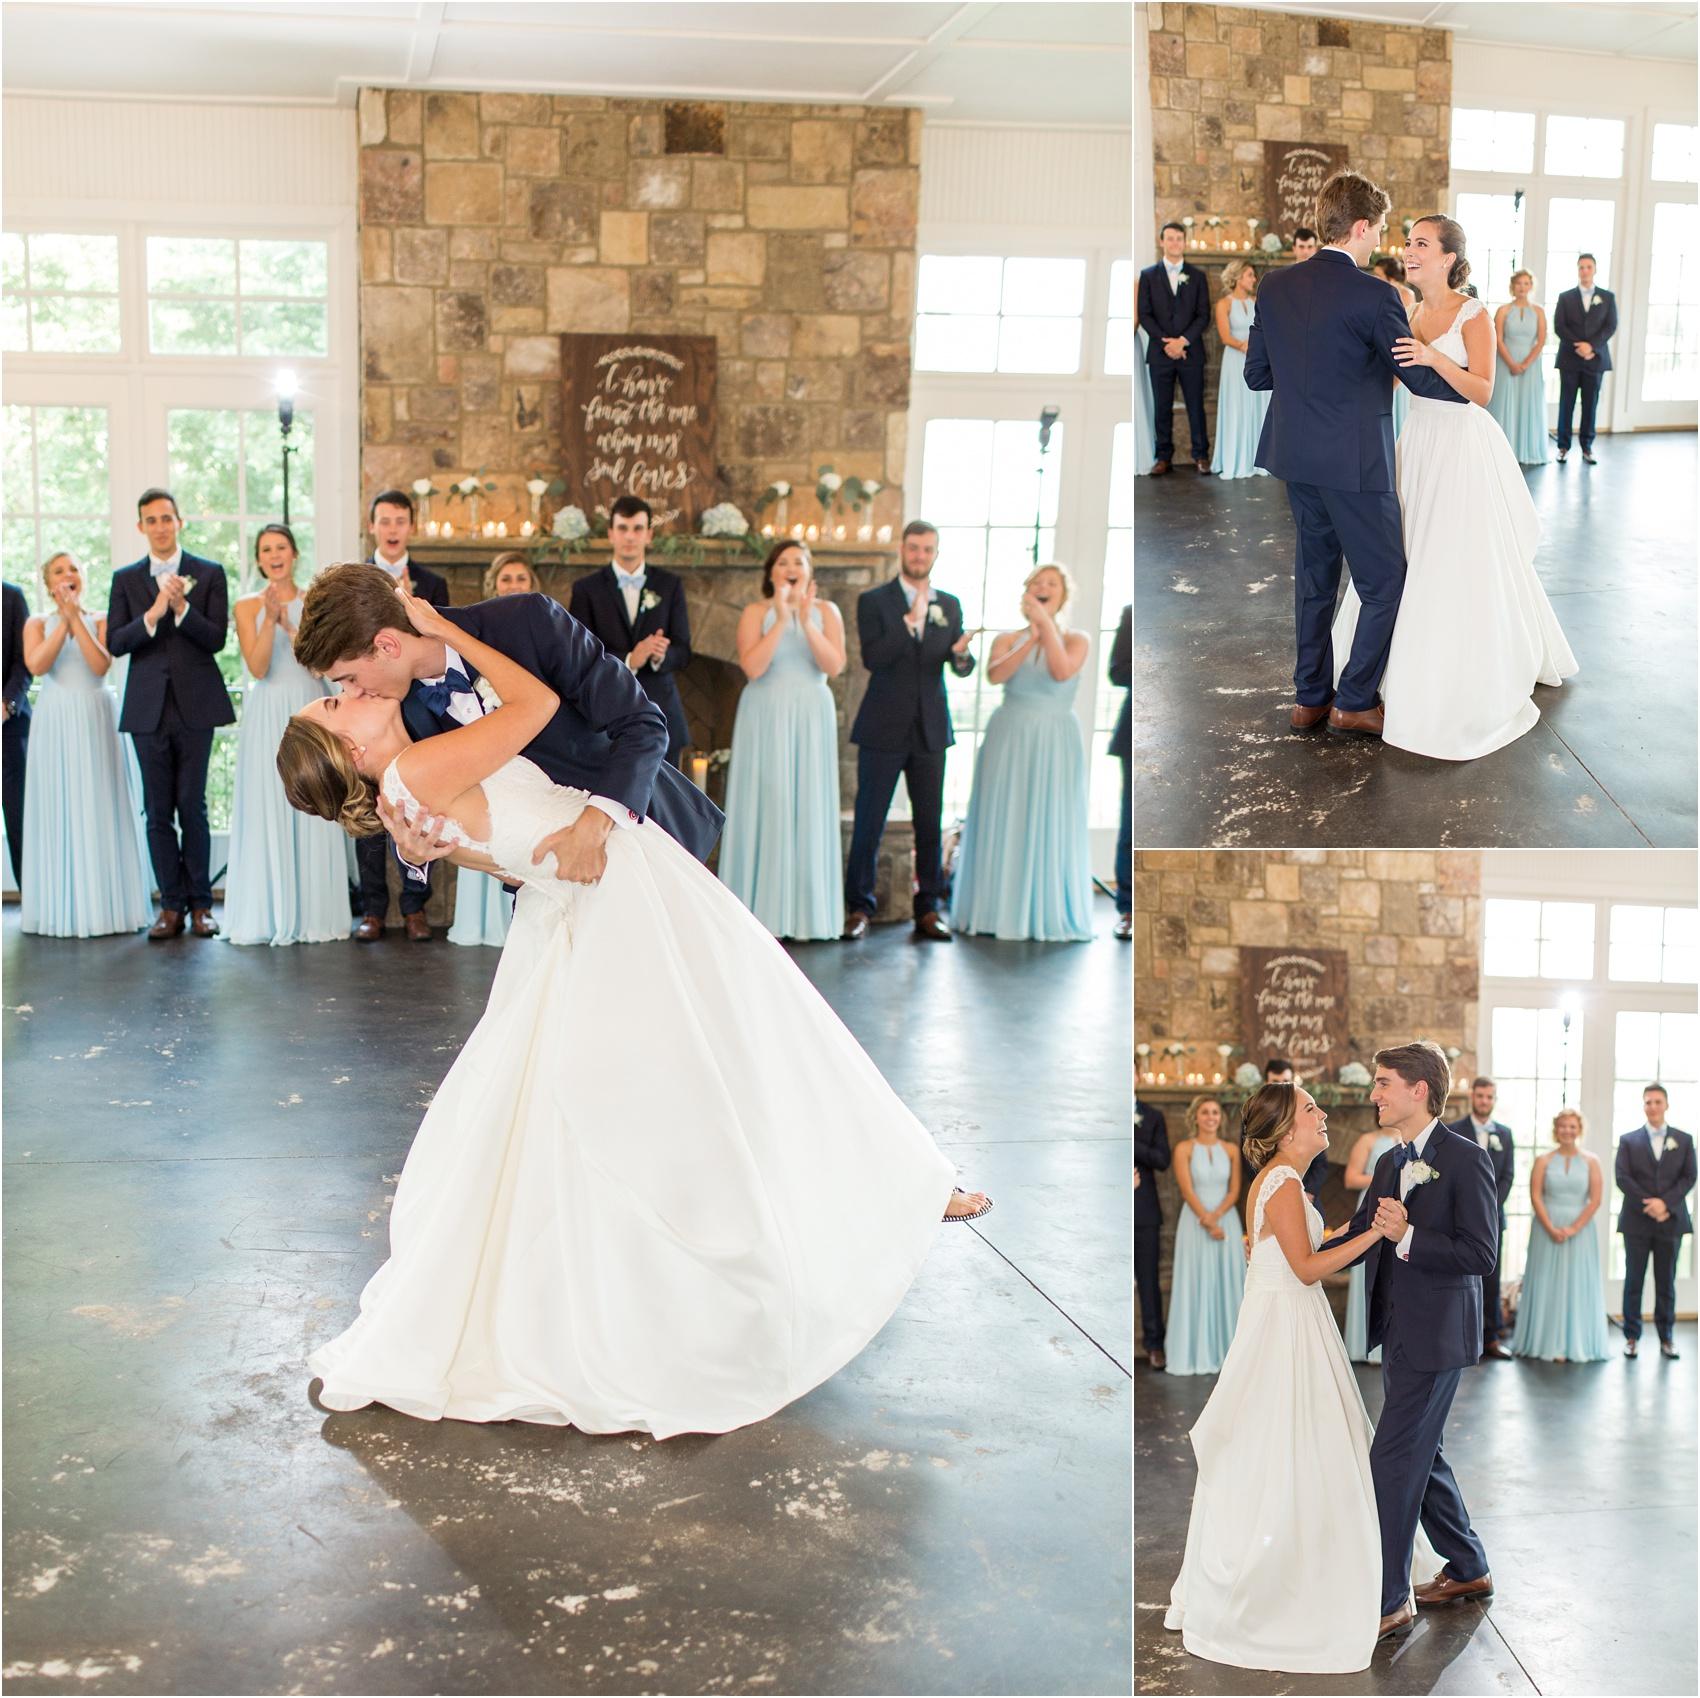 Savannah Eve Photography- Sigl-Adams Wedding- Sneak Peek-71.jpg